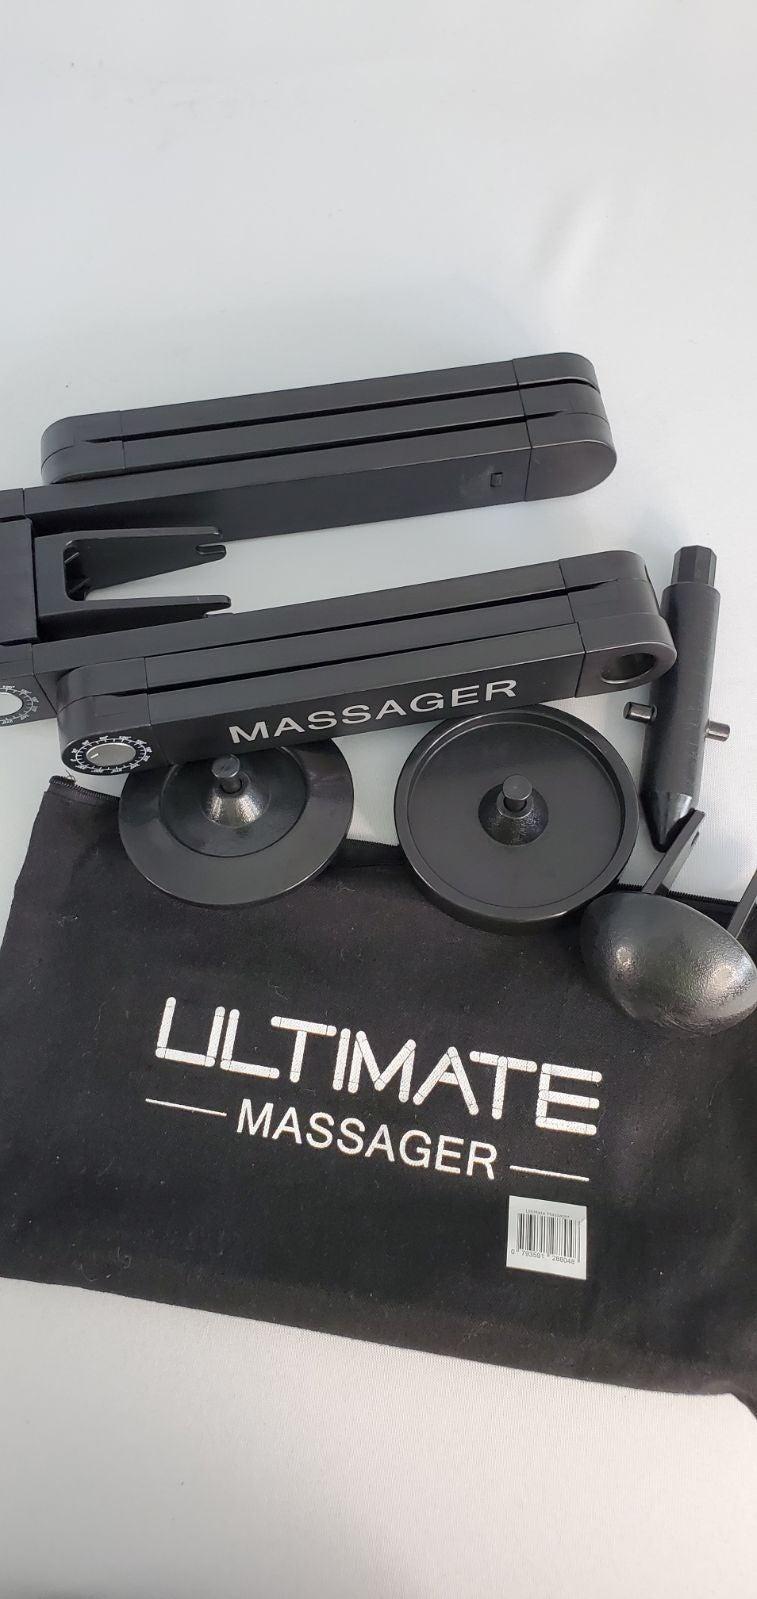 Ultimate Massager